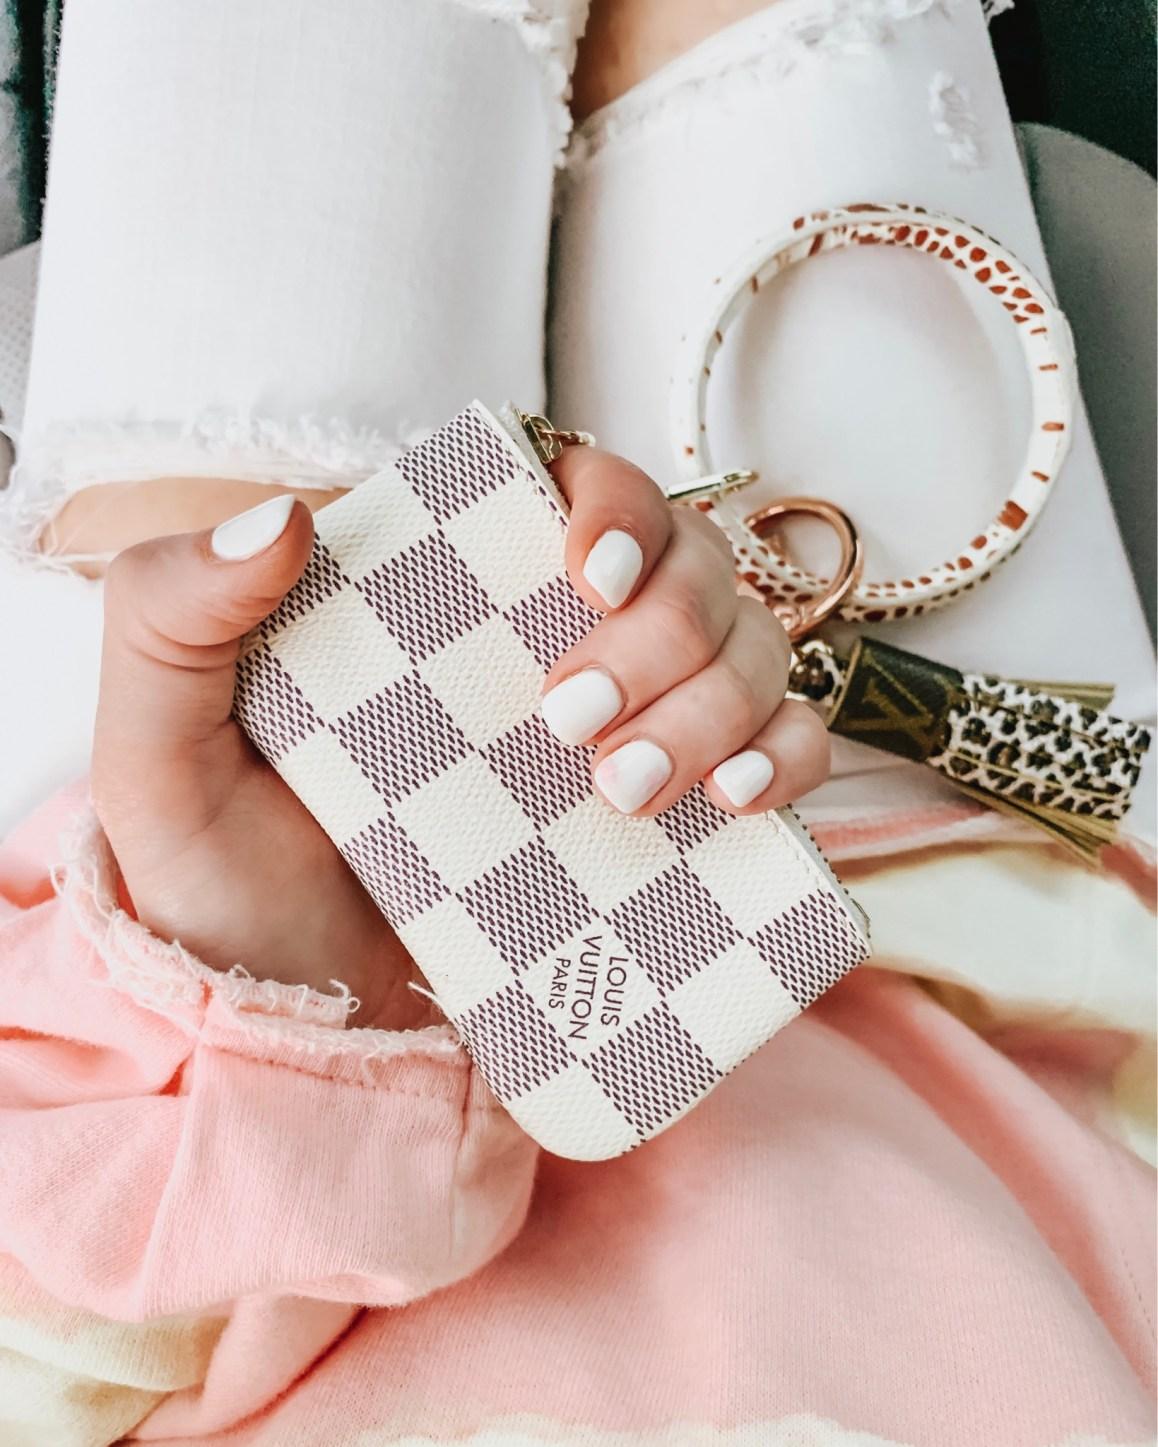 Louis Vuitton Pouch Dupe Key Ring